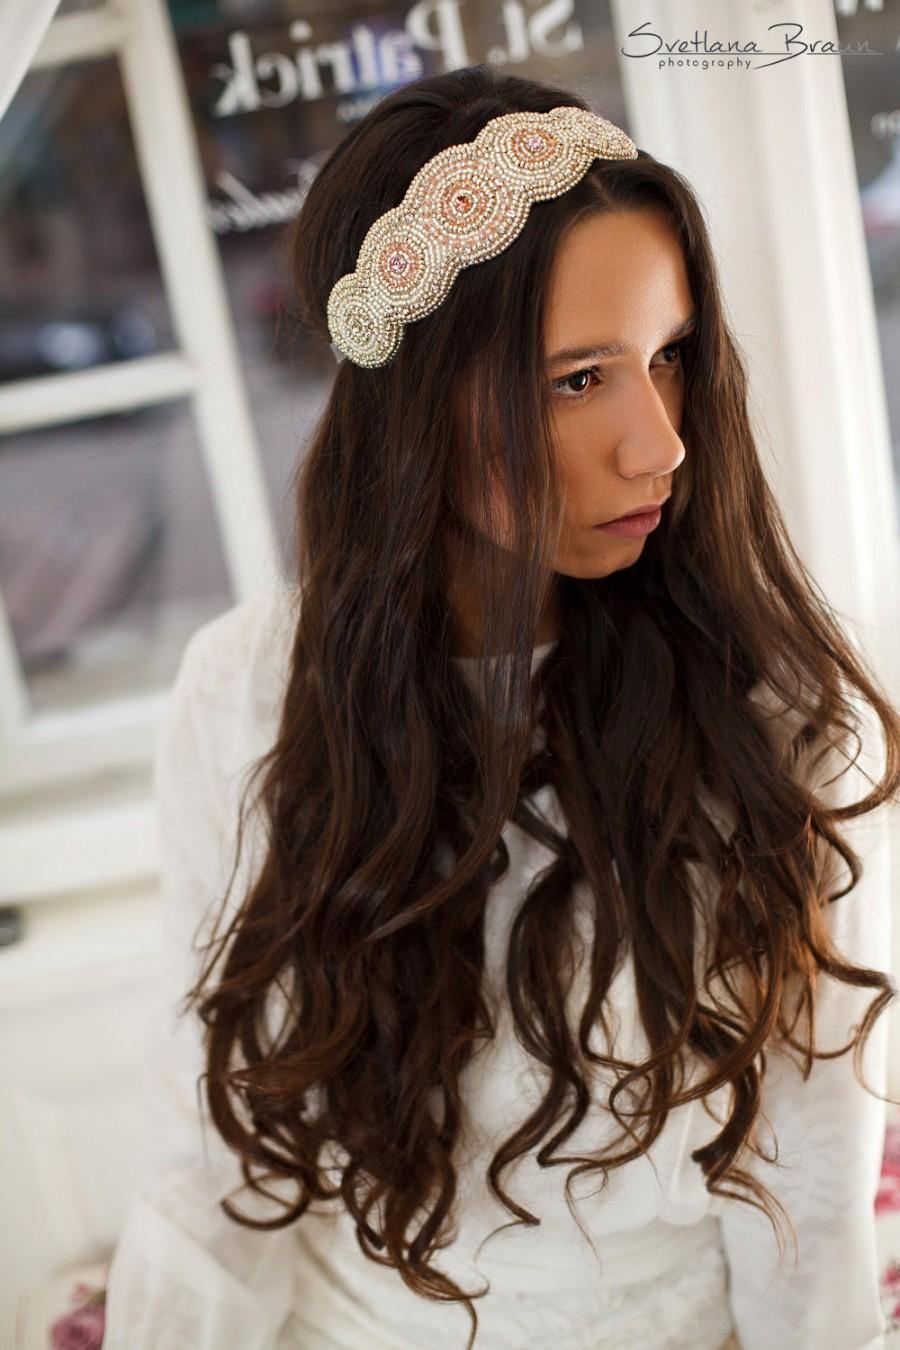 Свадьба - Bridal forehead band,Bridal crystal head band,Crystal wedding headband, Wedding statement headpiece,Glamorous wedding couture hair piece